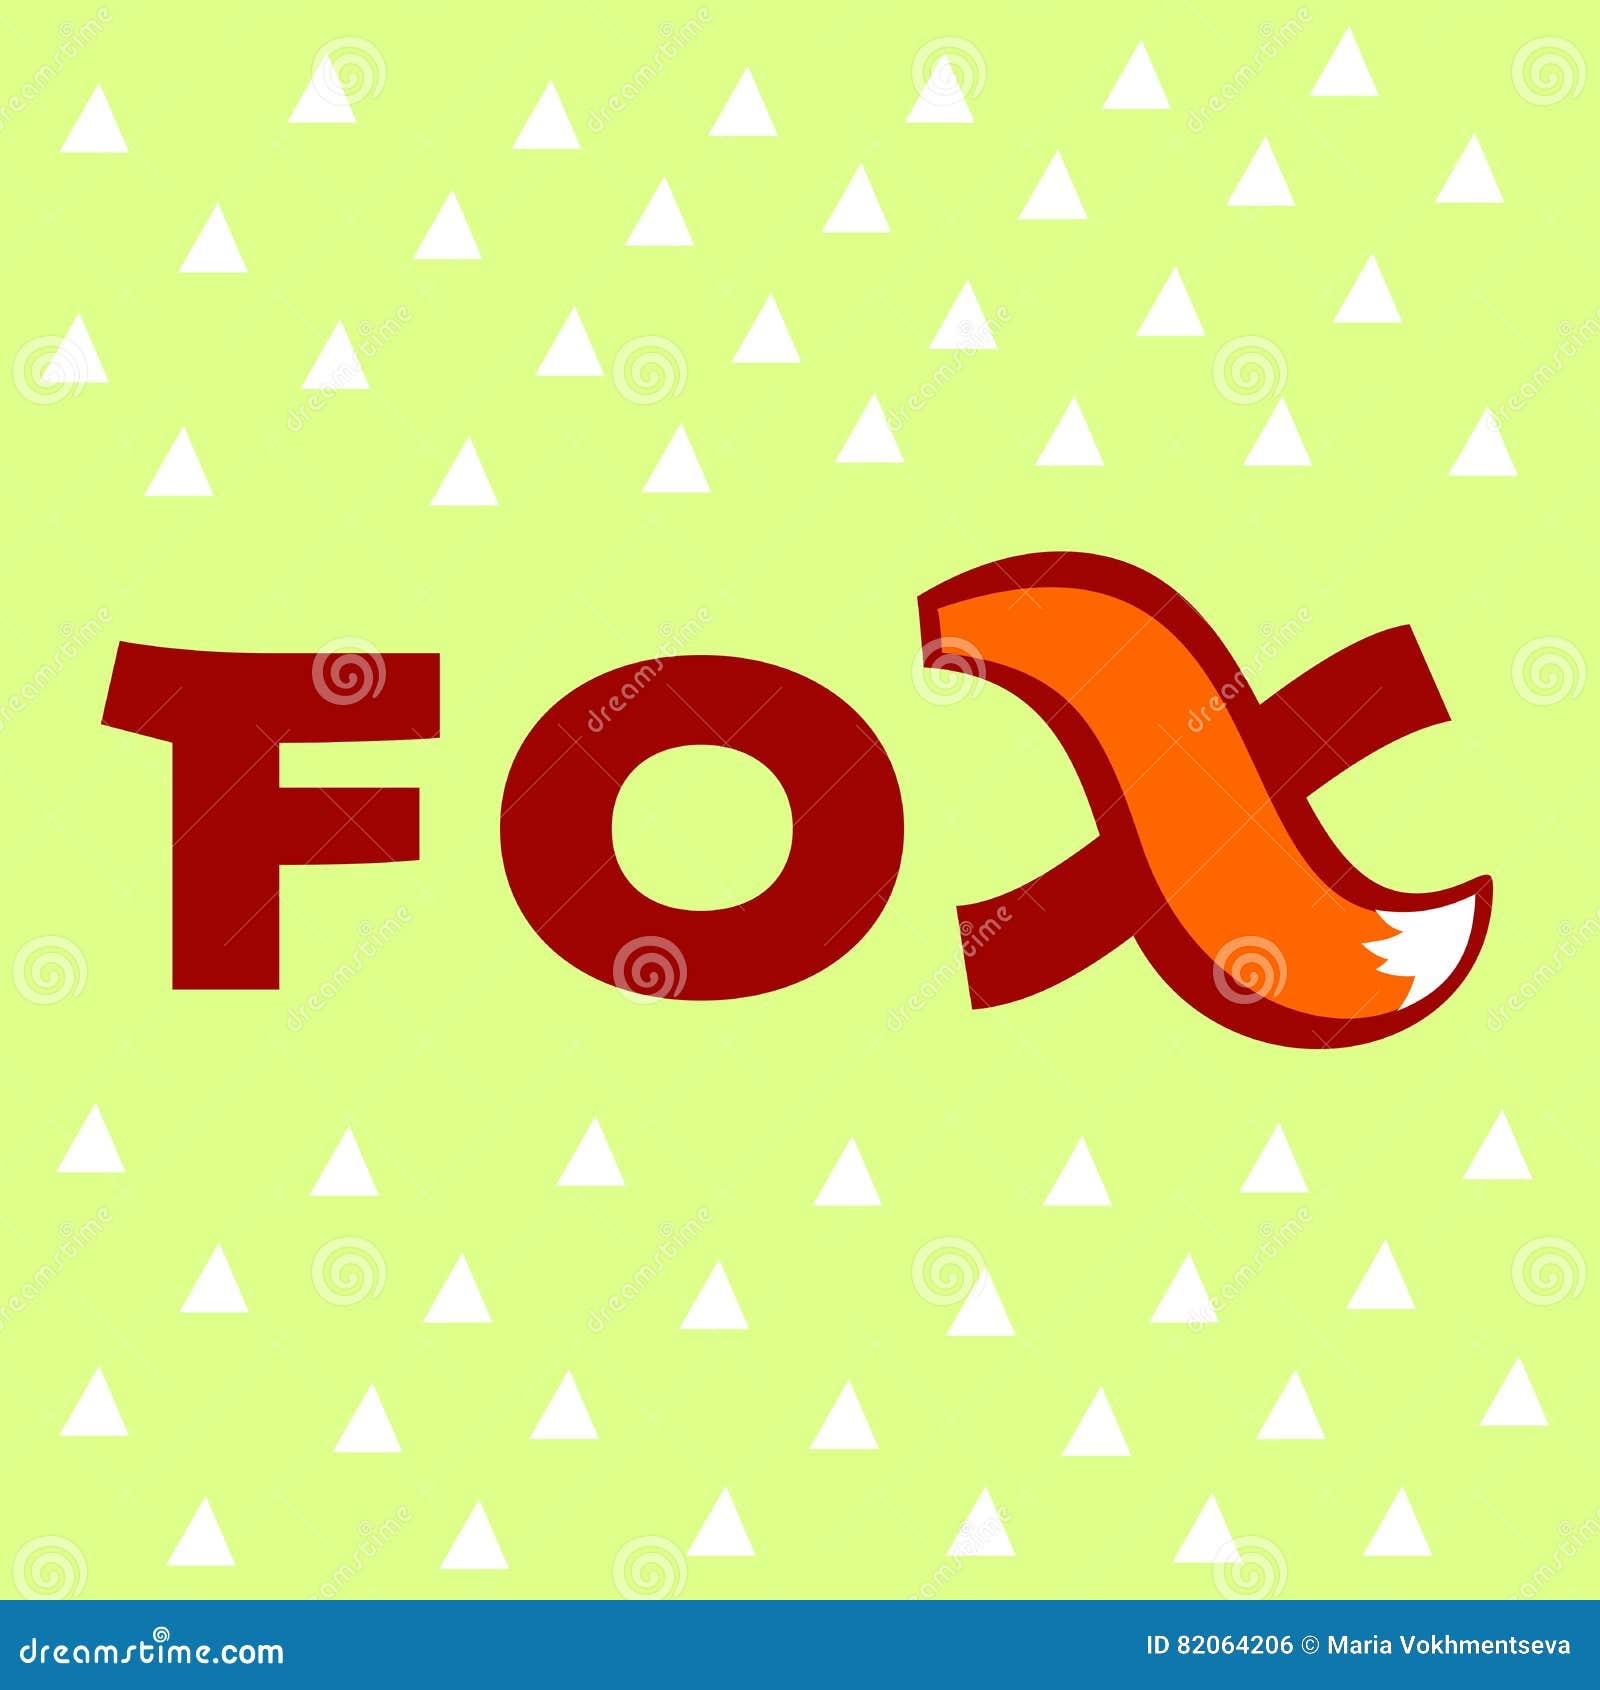 Fox tail logo stock vector  Illustration of foxy, illustration